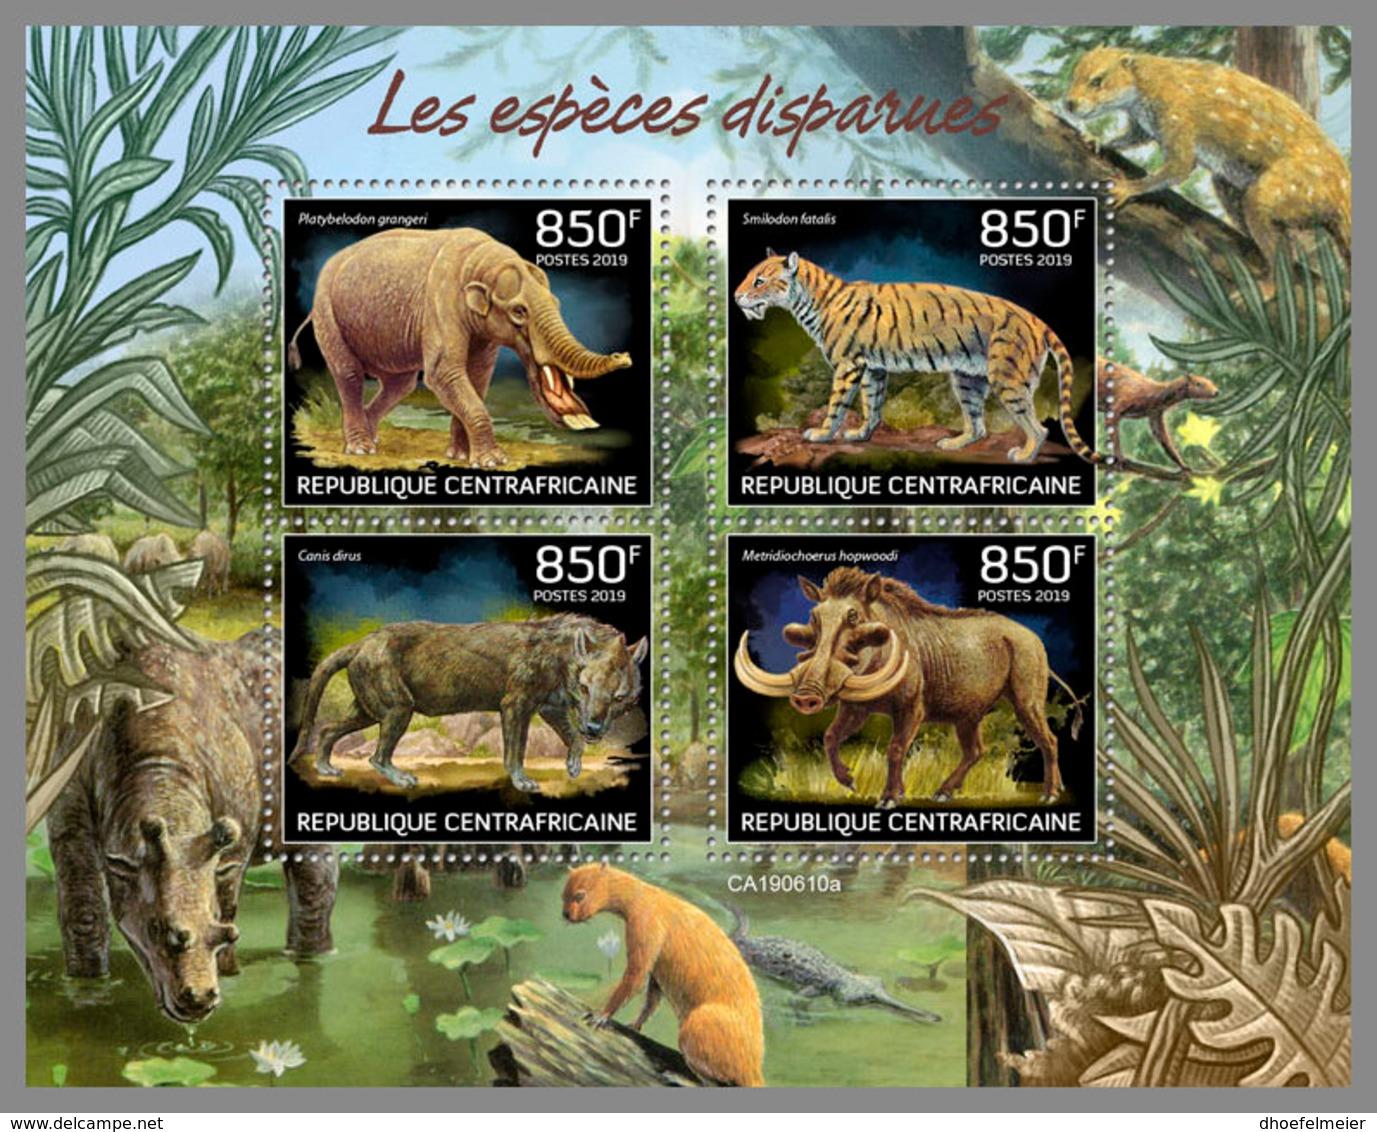 CENTRALAFRICA 2019 MNH Extinct Species Ausgestorbene Tiere Especes Disparues M/S - OFFICIAL ISSUE - DH1937 - Prehistorics